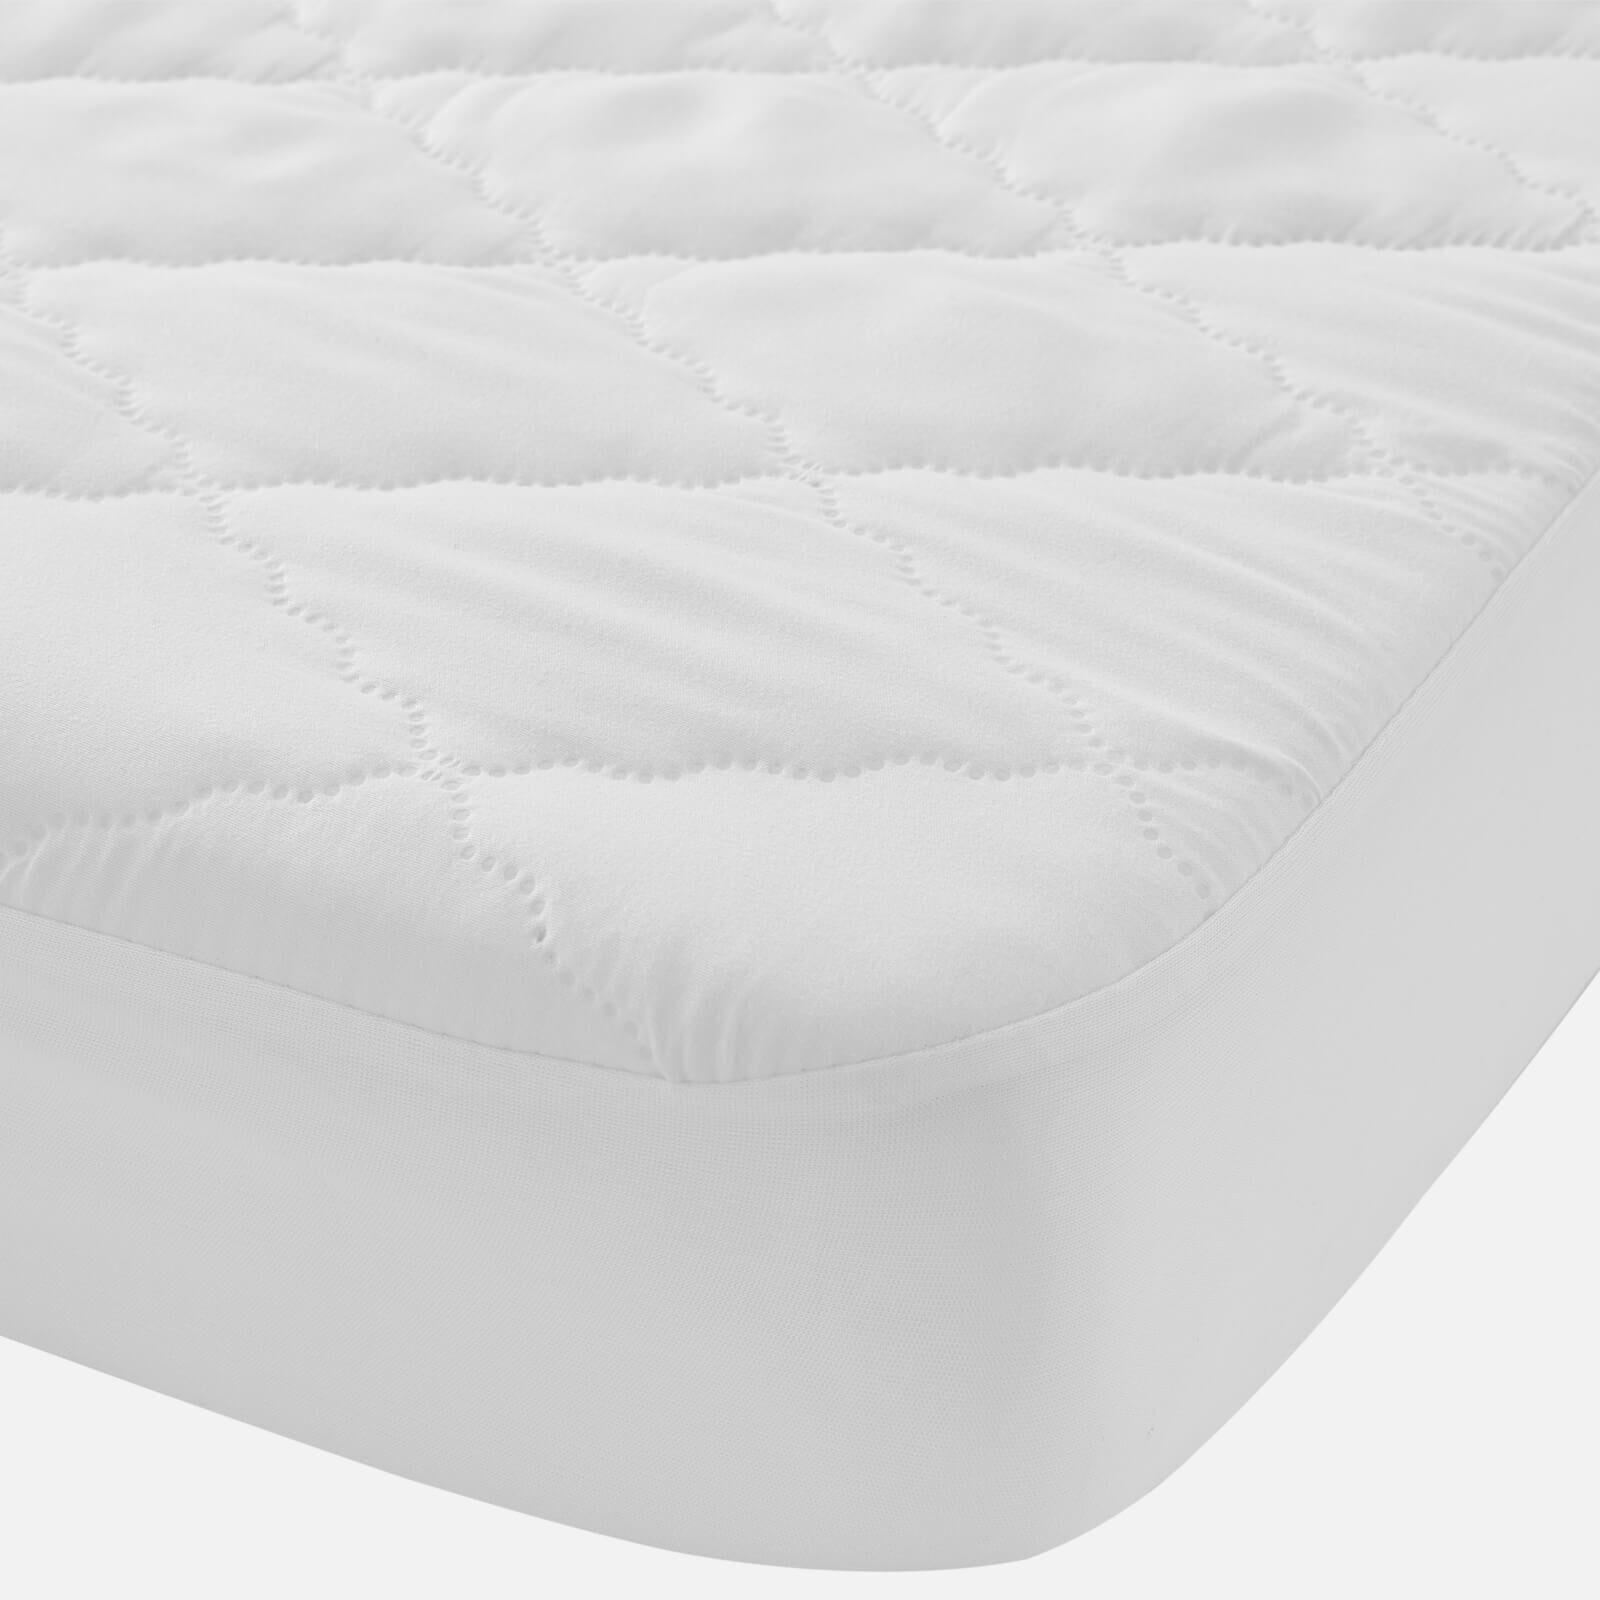 in homeware Simplecare Mattress Protector - White - Small Cotbed